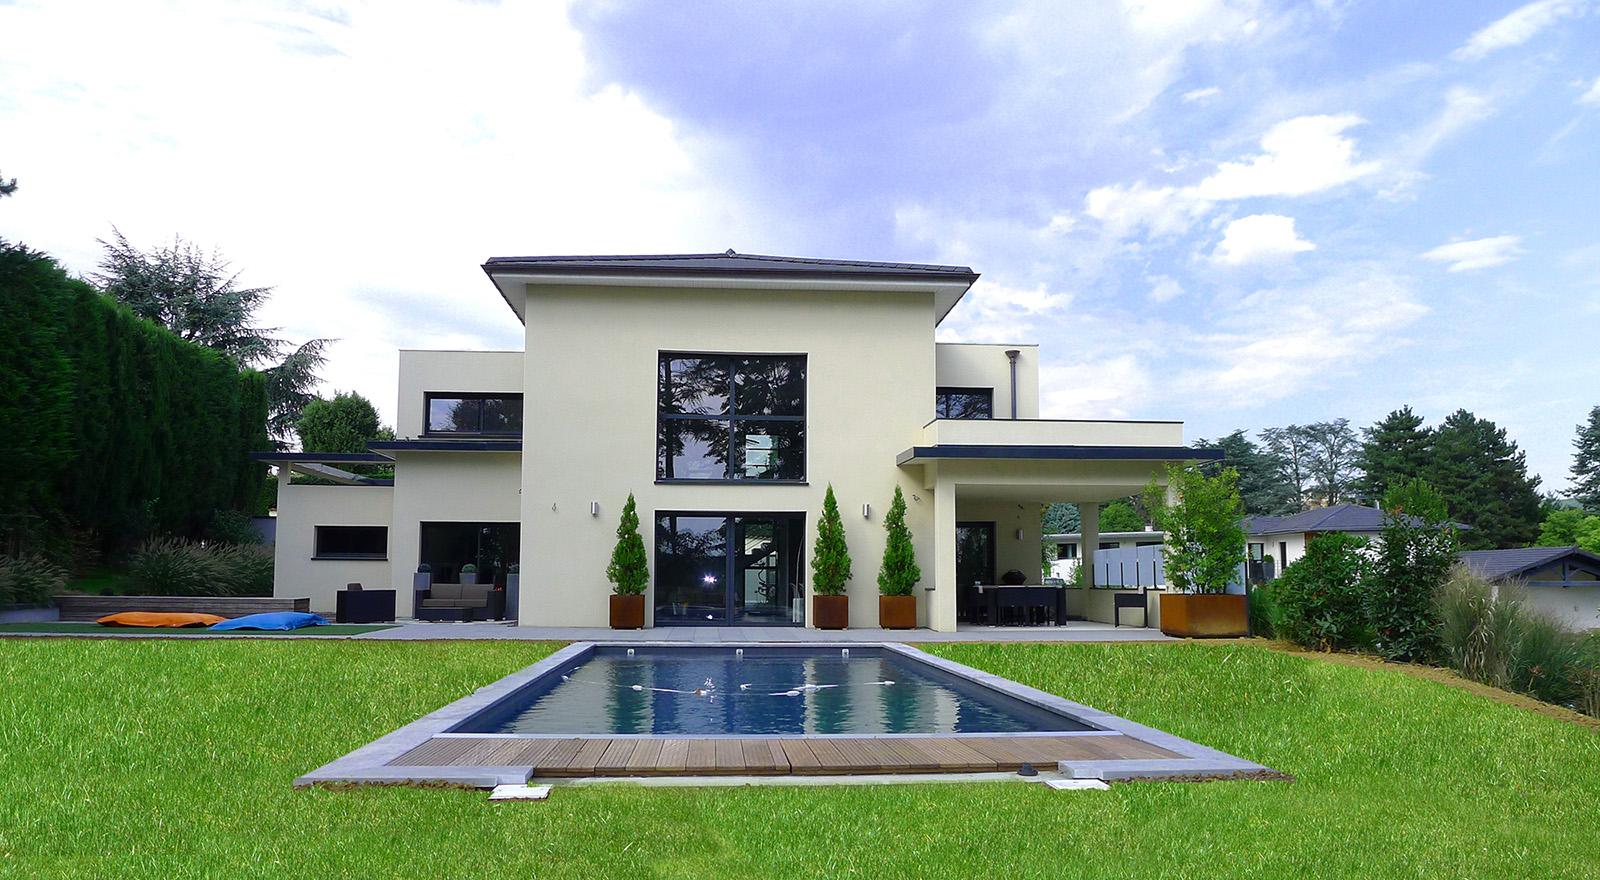 Constructeur maison haut de gamme ventana blog for Maison haut de gamme